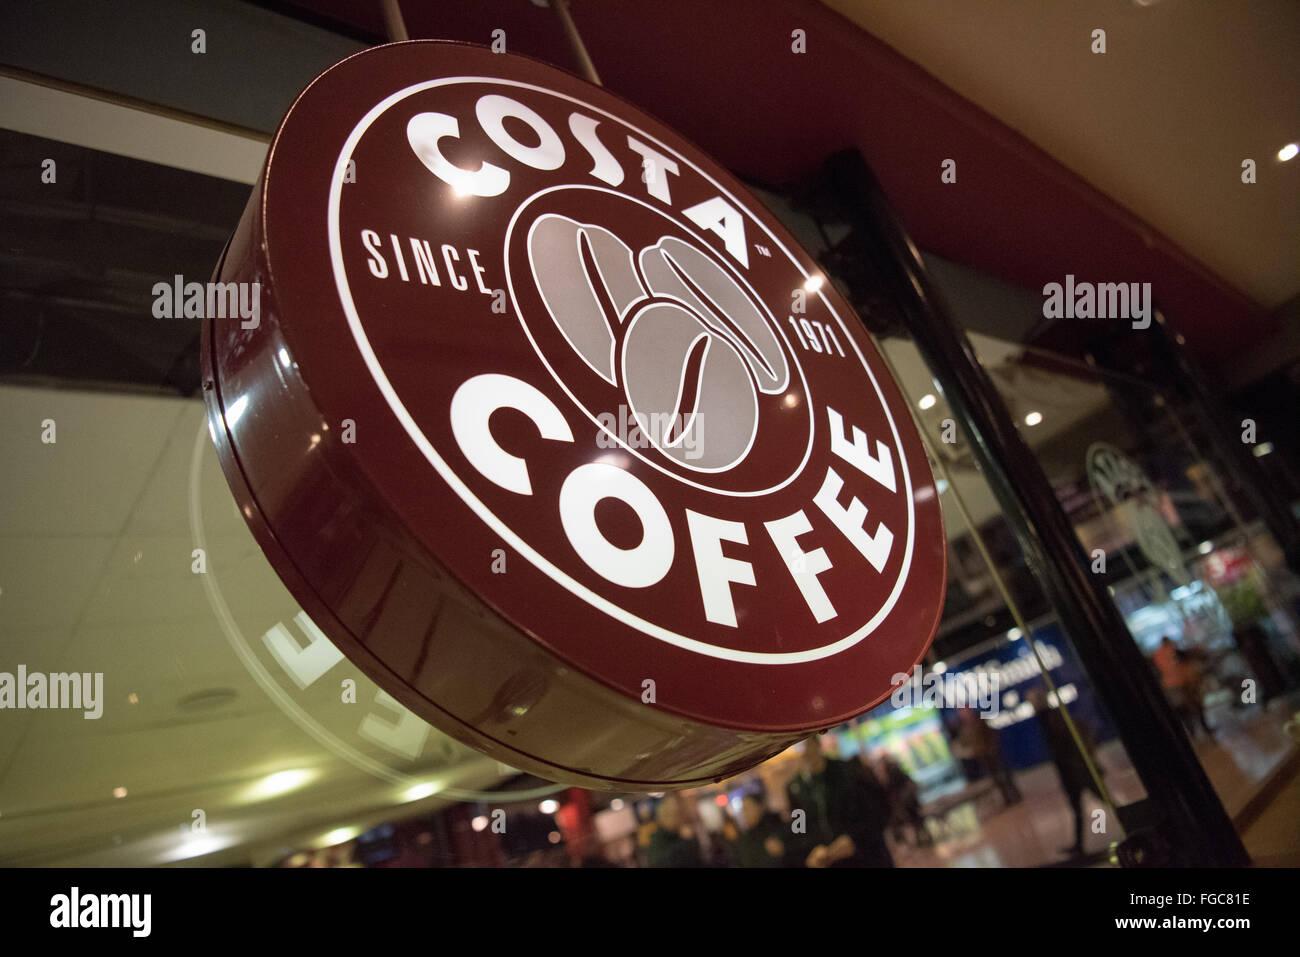 Barista Coffee Shop Stockport